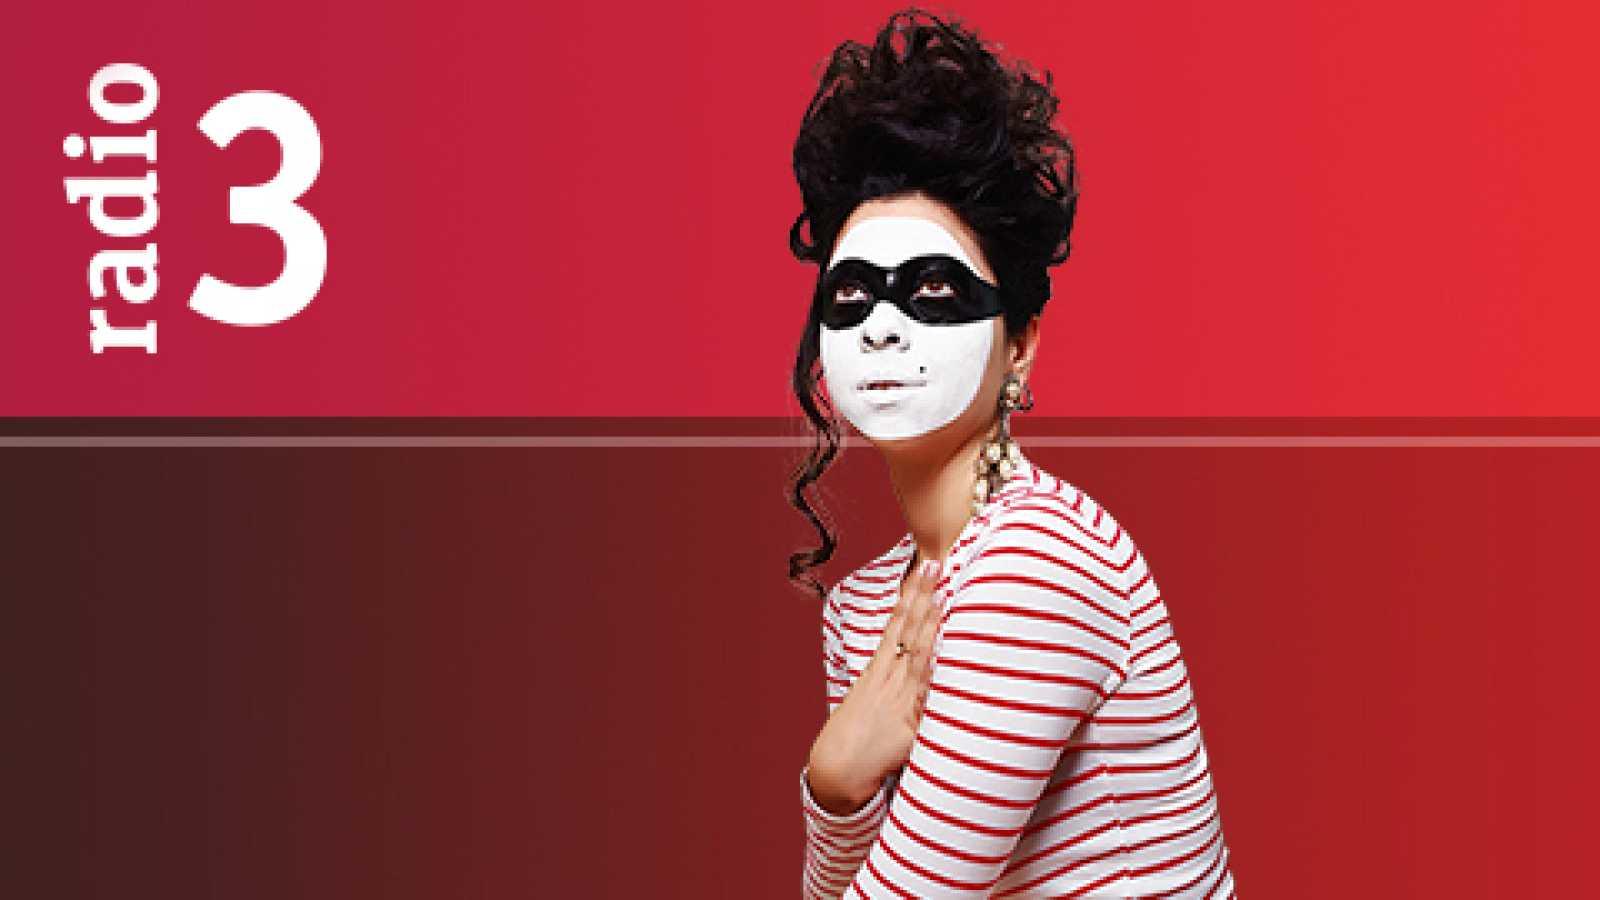 Dramedias con Paloma Cortina - Teatro con denominación de origen balear - 16/04/17